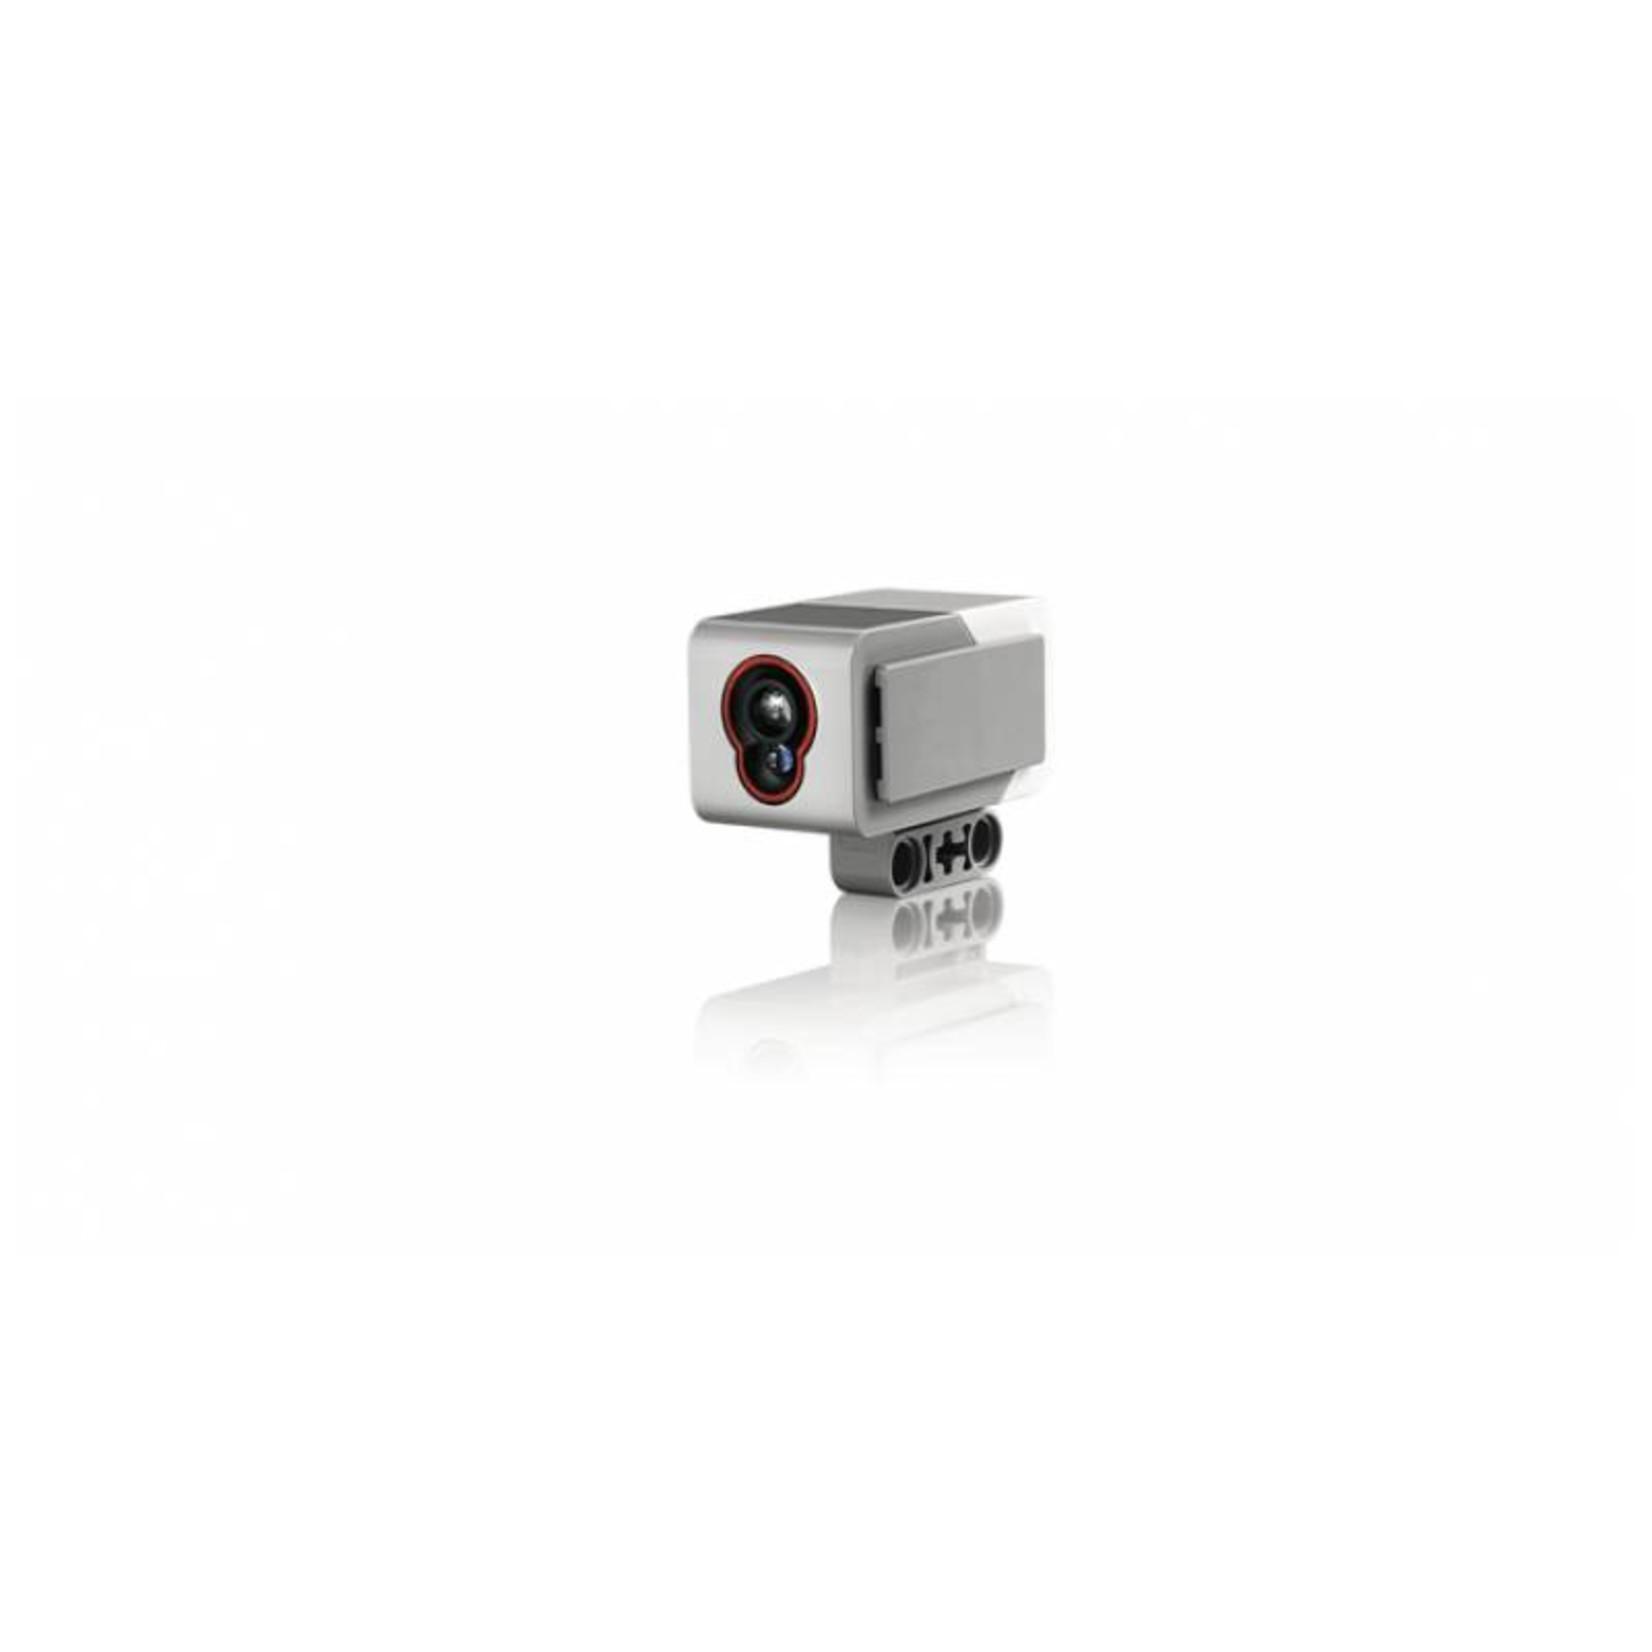 LEGO® Education EV3 Kleur/licht Sensor